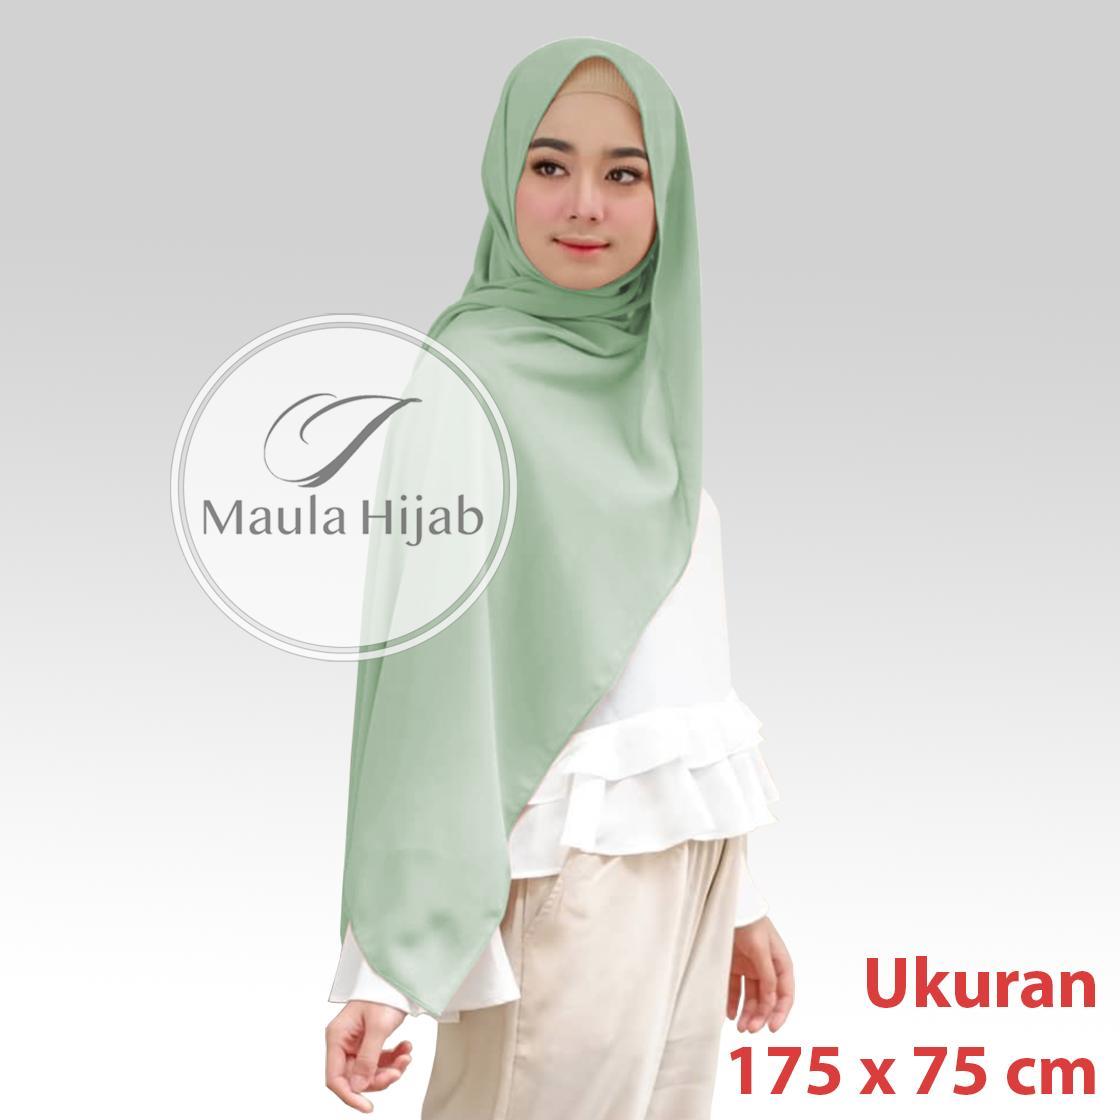 Maula Hijab Kerudung Jilbab Terbaru 2019 Pasmina Sabyan Polos Wanita Terbaru Pashmina Sabyan Pasmina Sabyan Diamond Style Trend Lebaran 2019